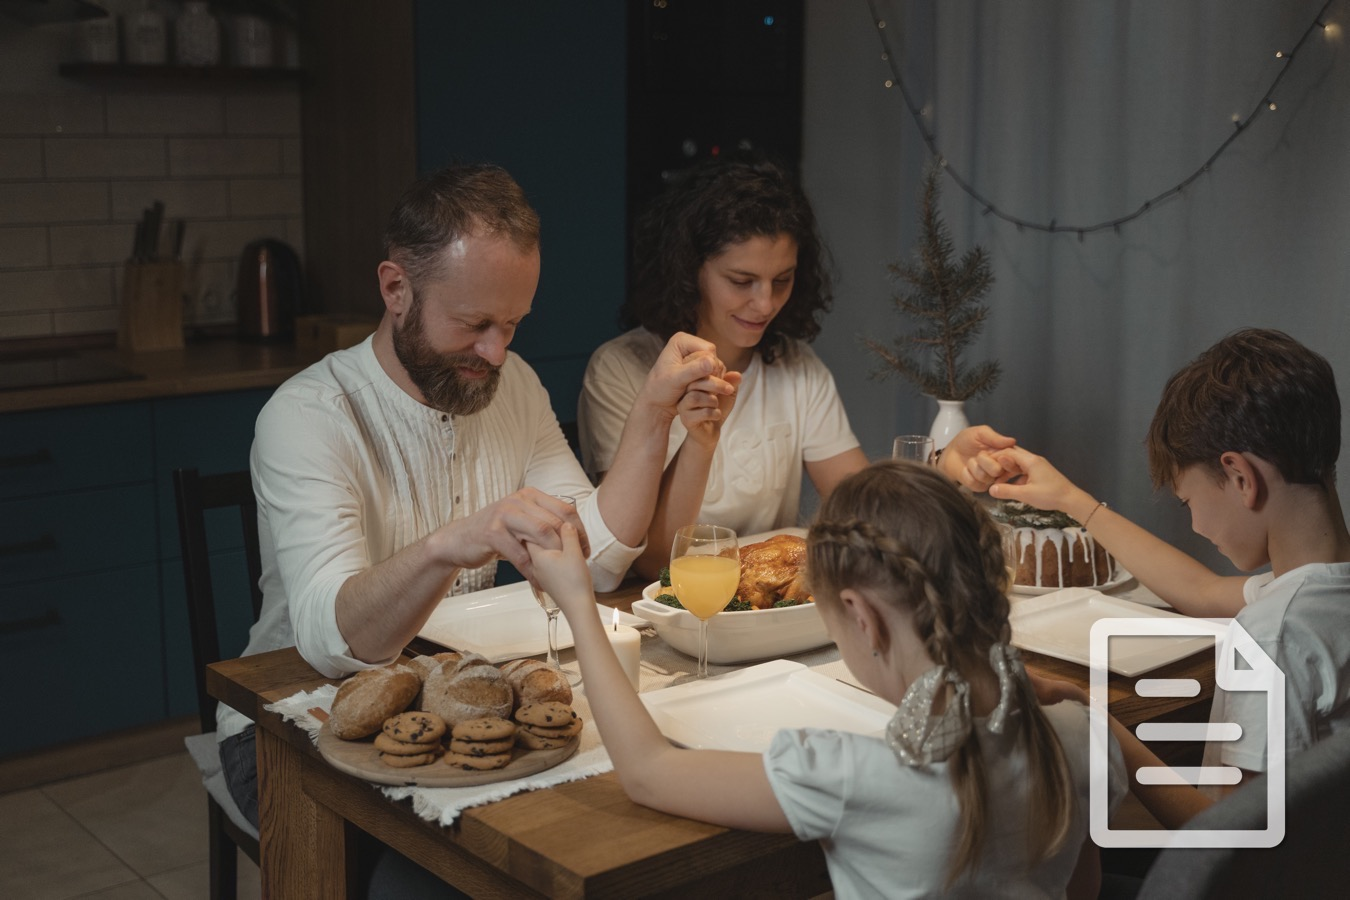 10 Tips for Leading Family Devotionals